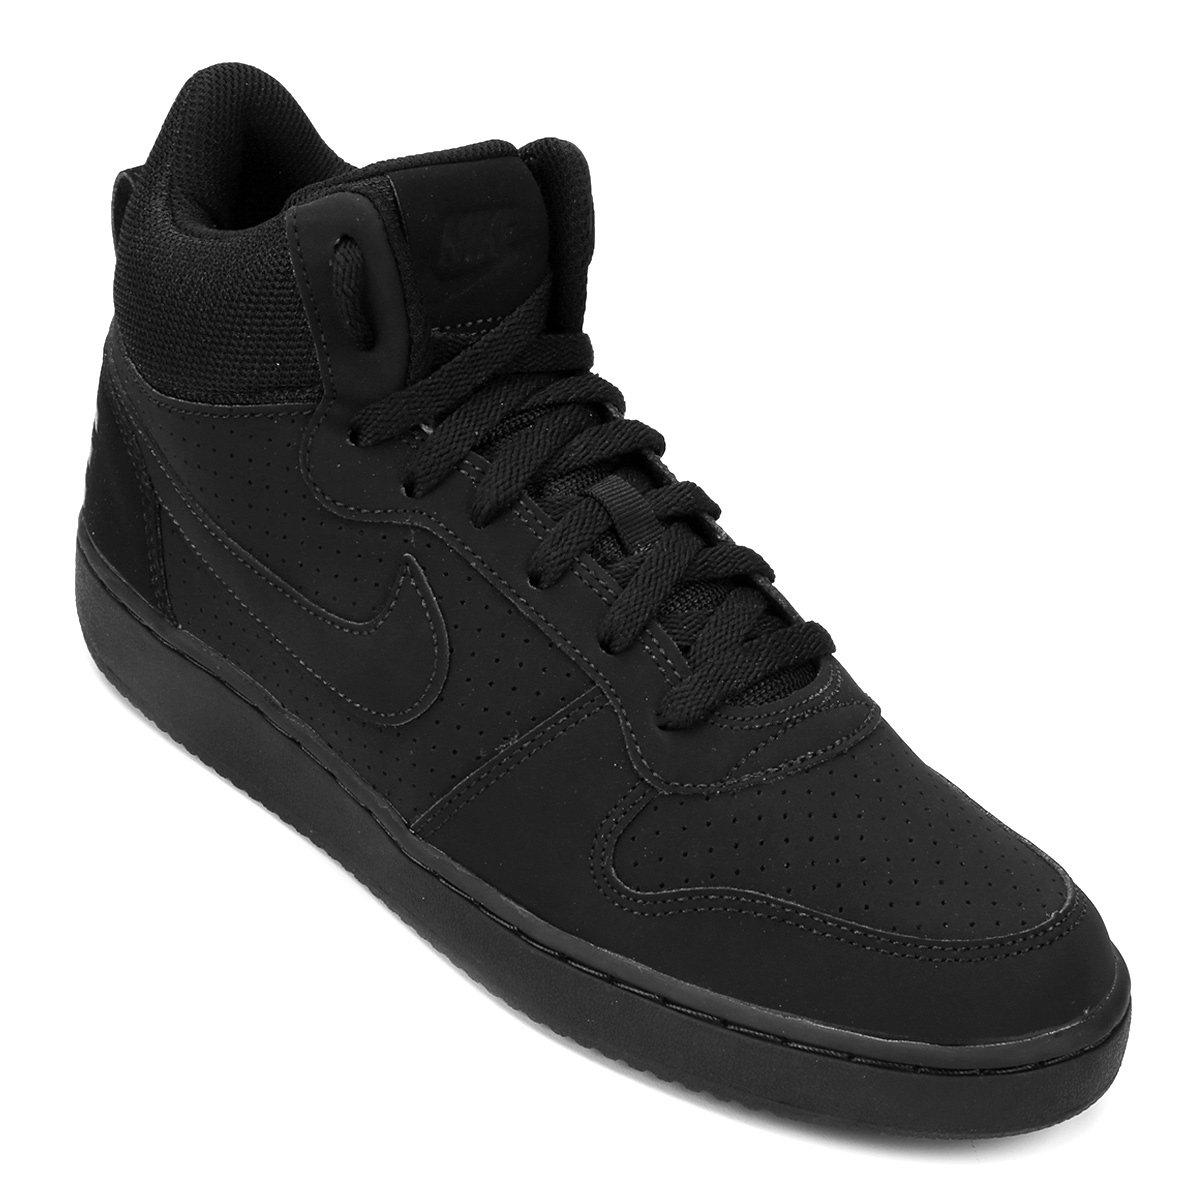 bb4079951b Tênis Couro Cano Alto Nike Recreation Mid Masculino